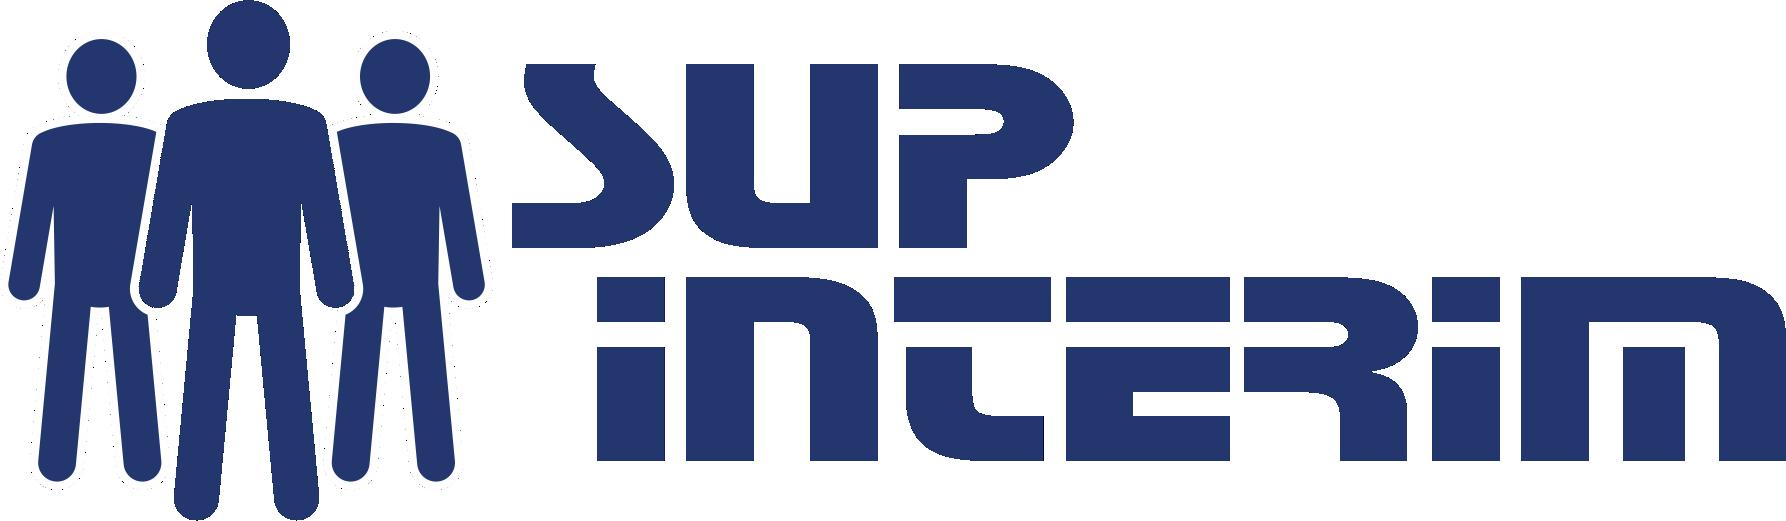 SUP Interim Caen agence d'intérim